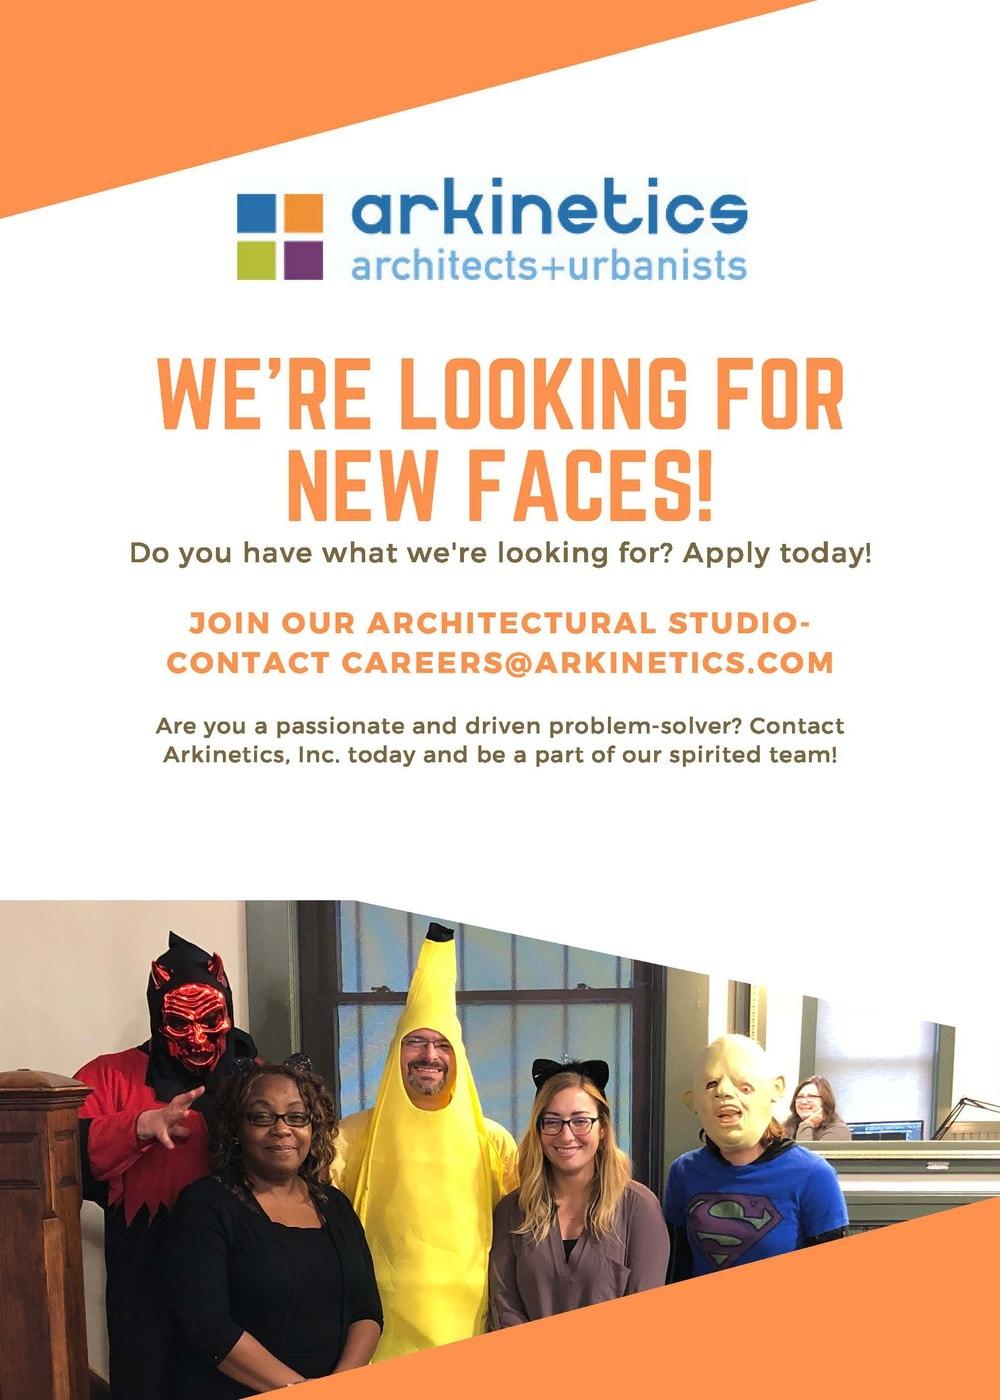 Arkinetics is hiring!